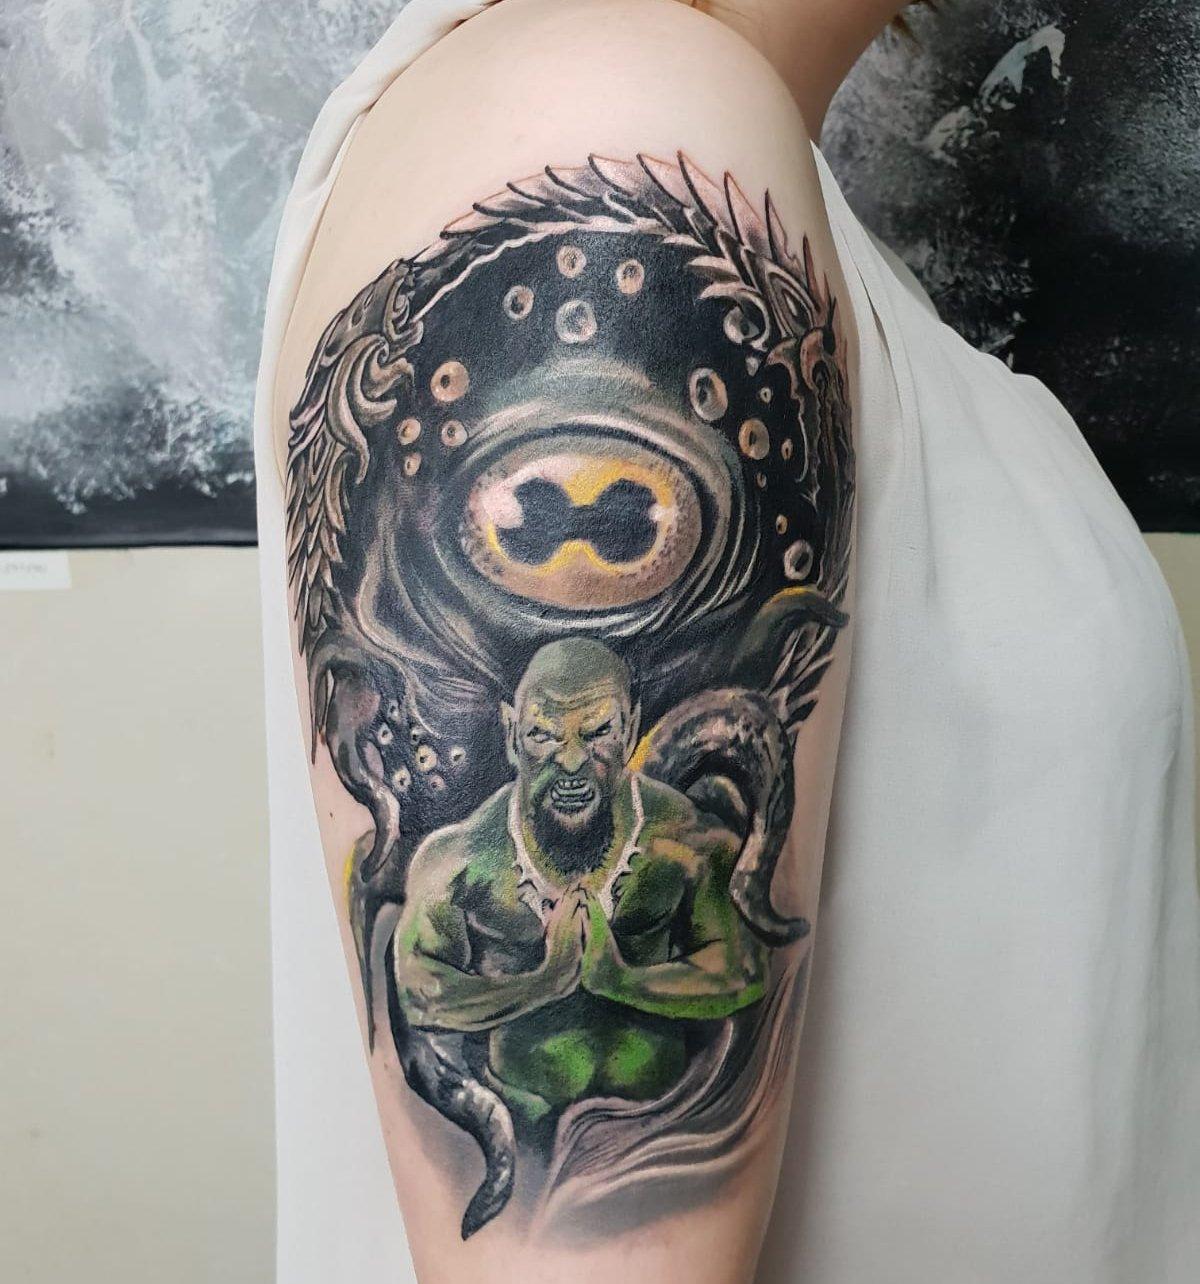 Morrowind Tattoo